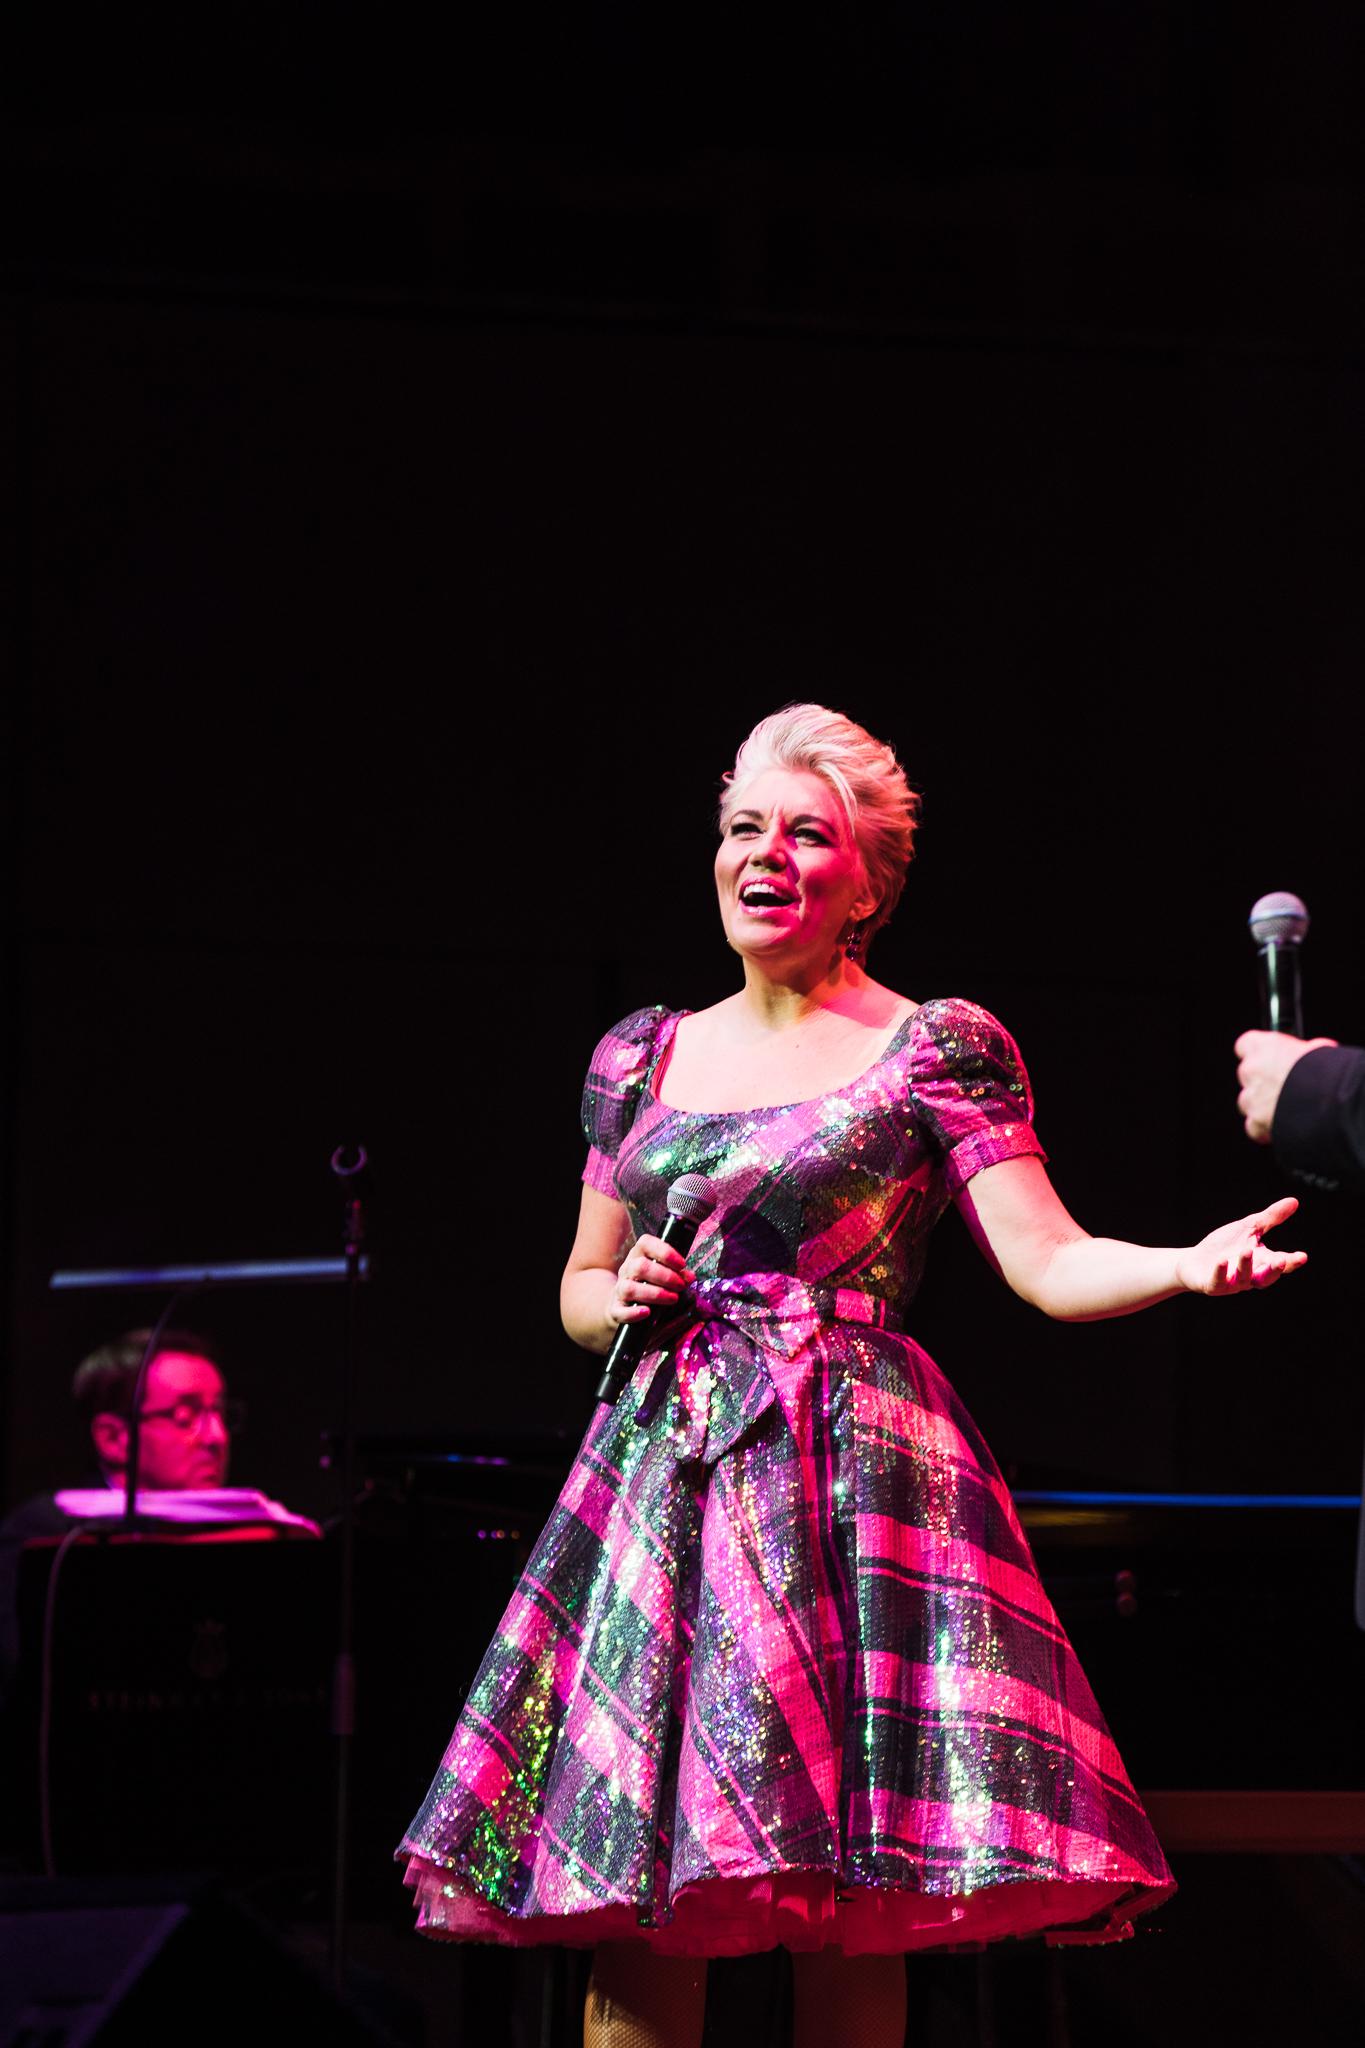 Melinda Schneider holding microphone on stage